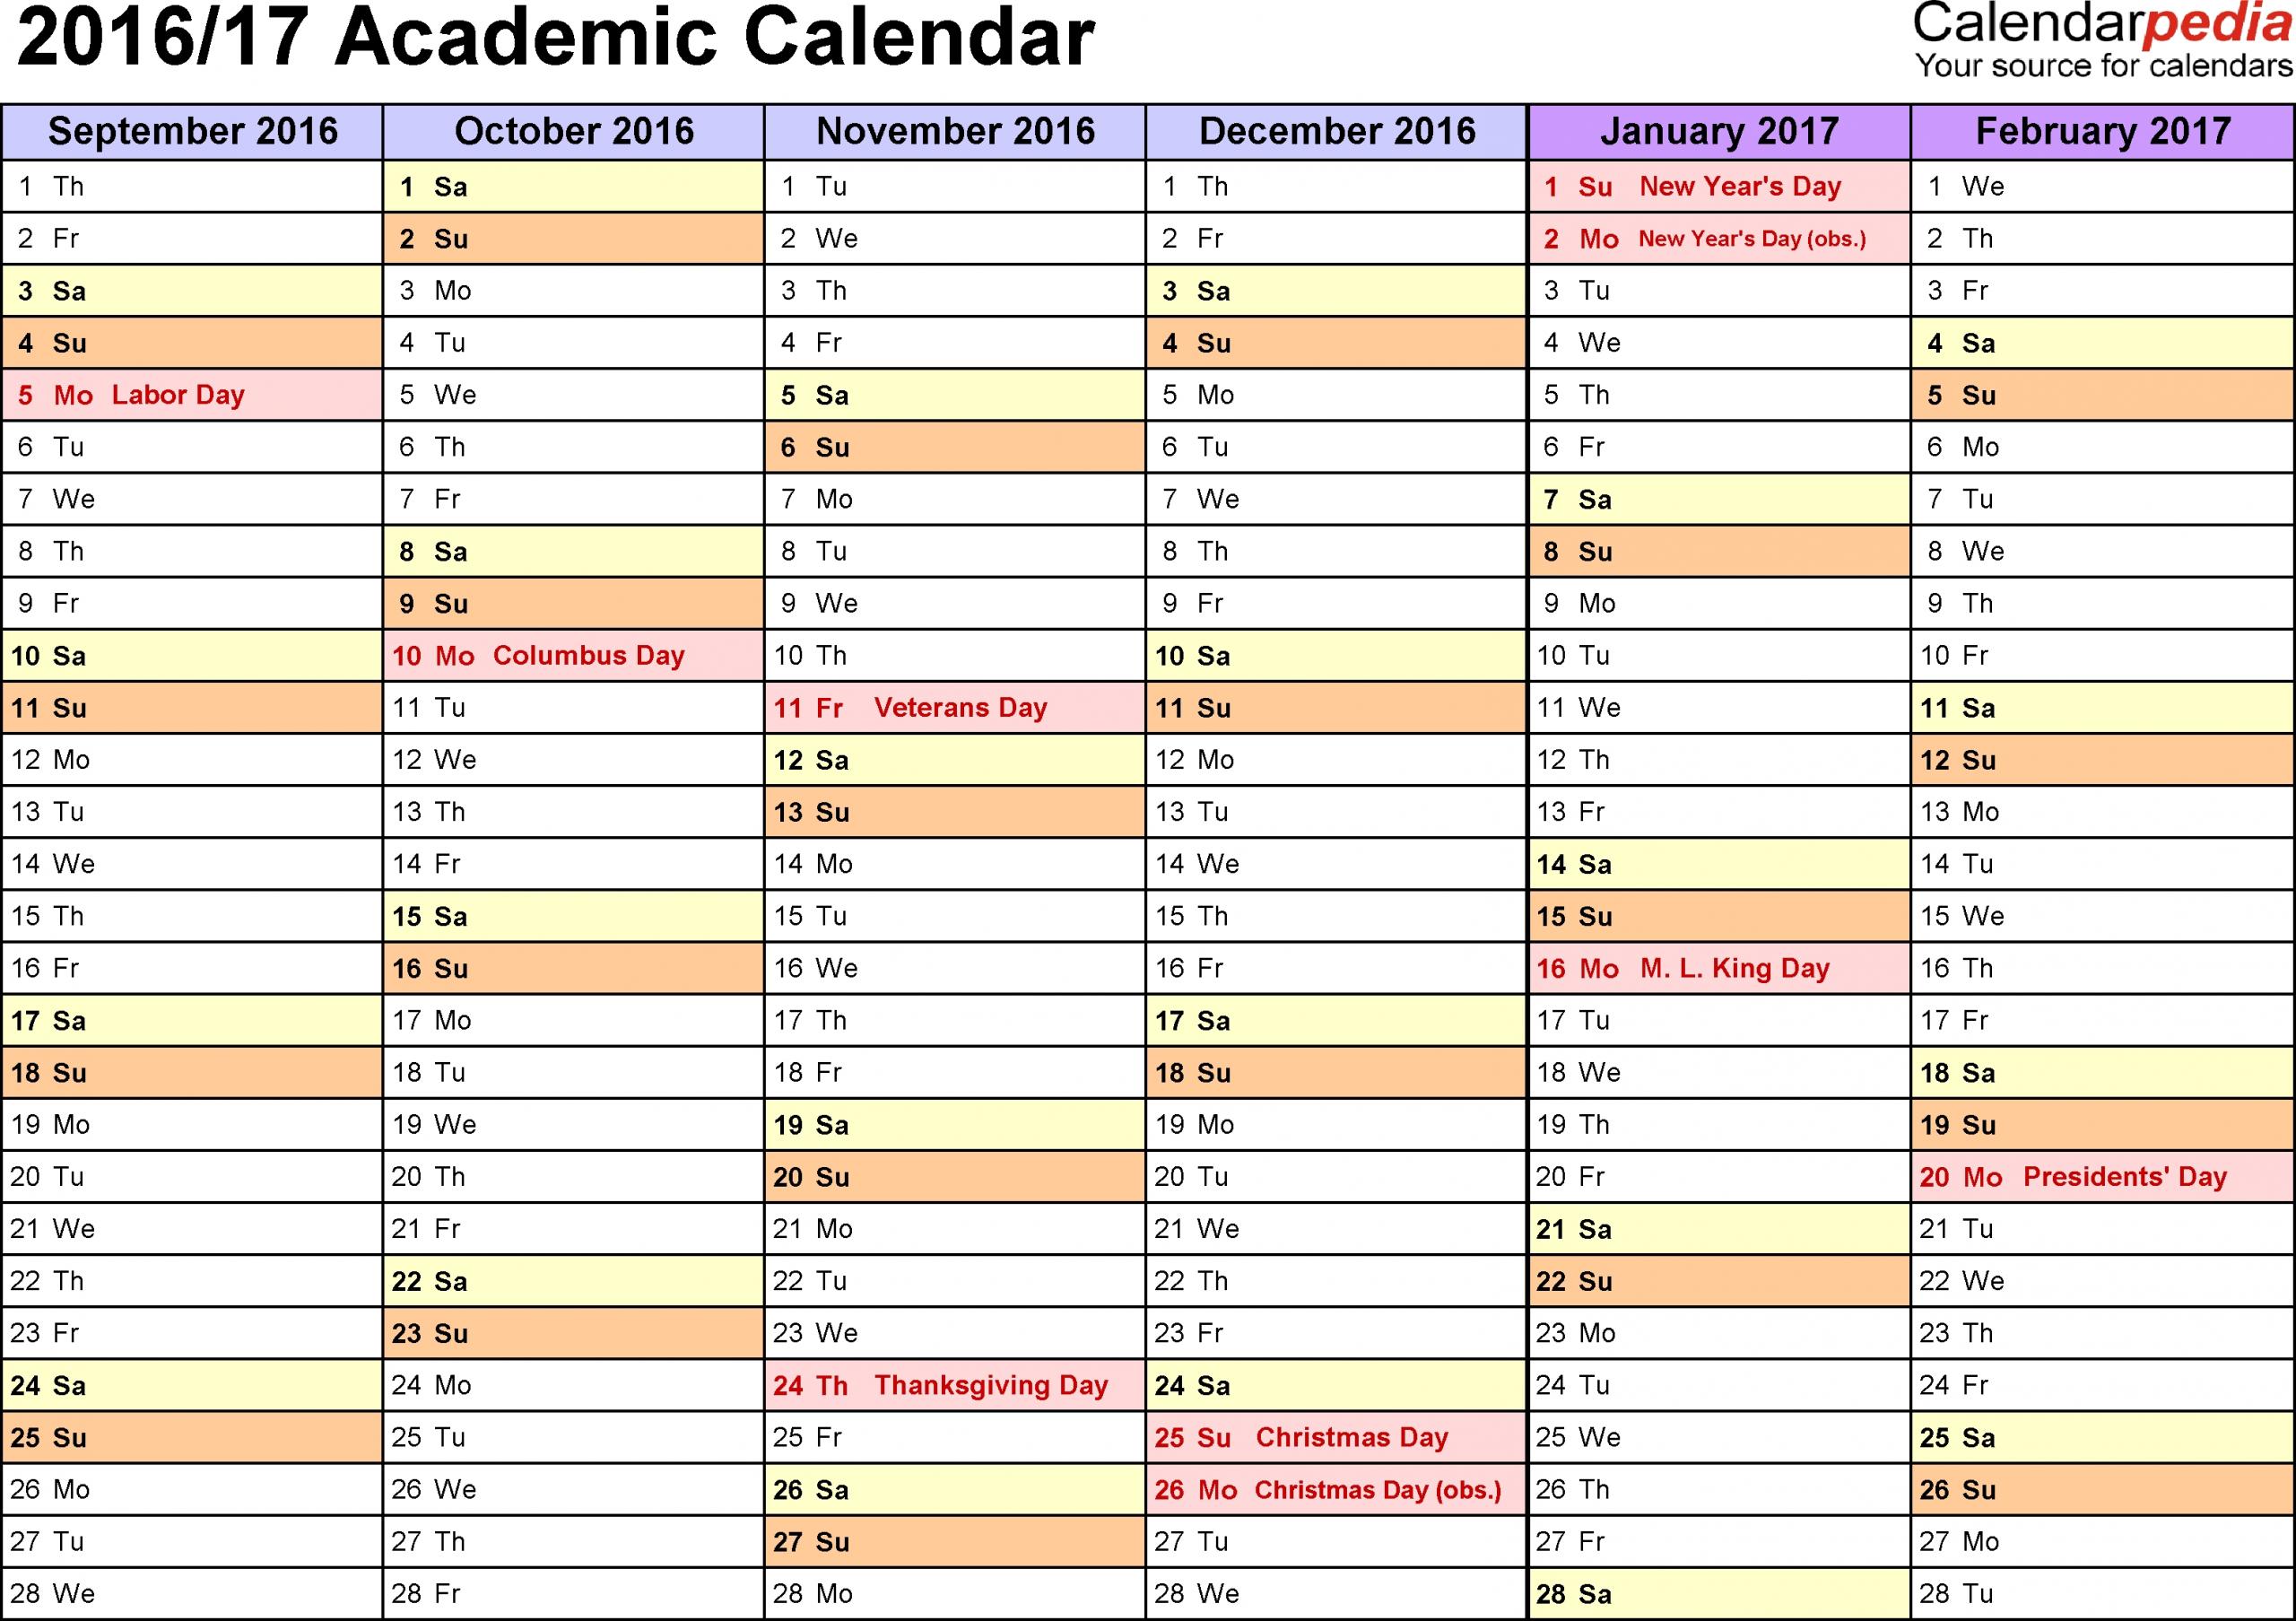 Template 3: Academic Calendar 2016/17 For Word, Landscape Orientation, Months Horizontally, 2